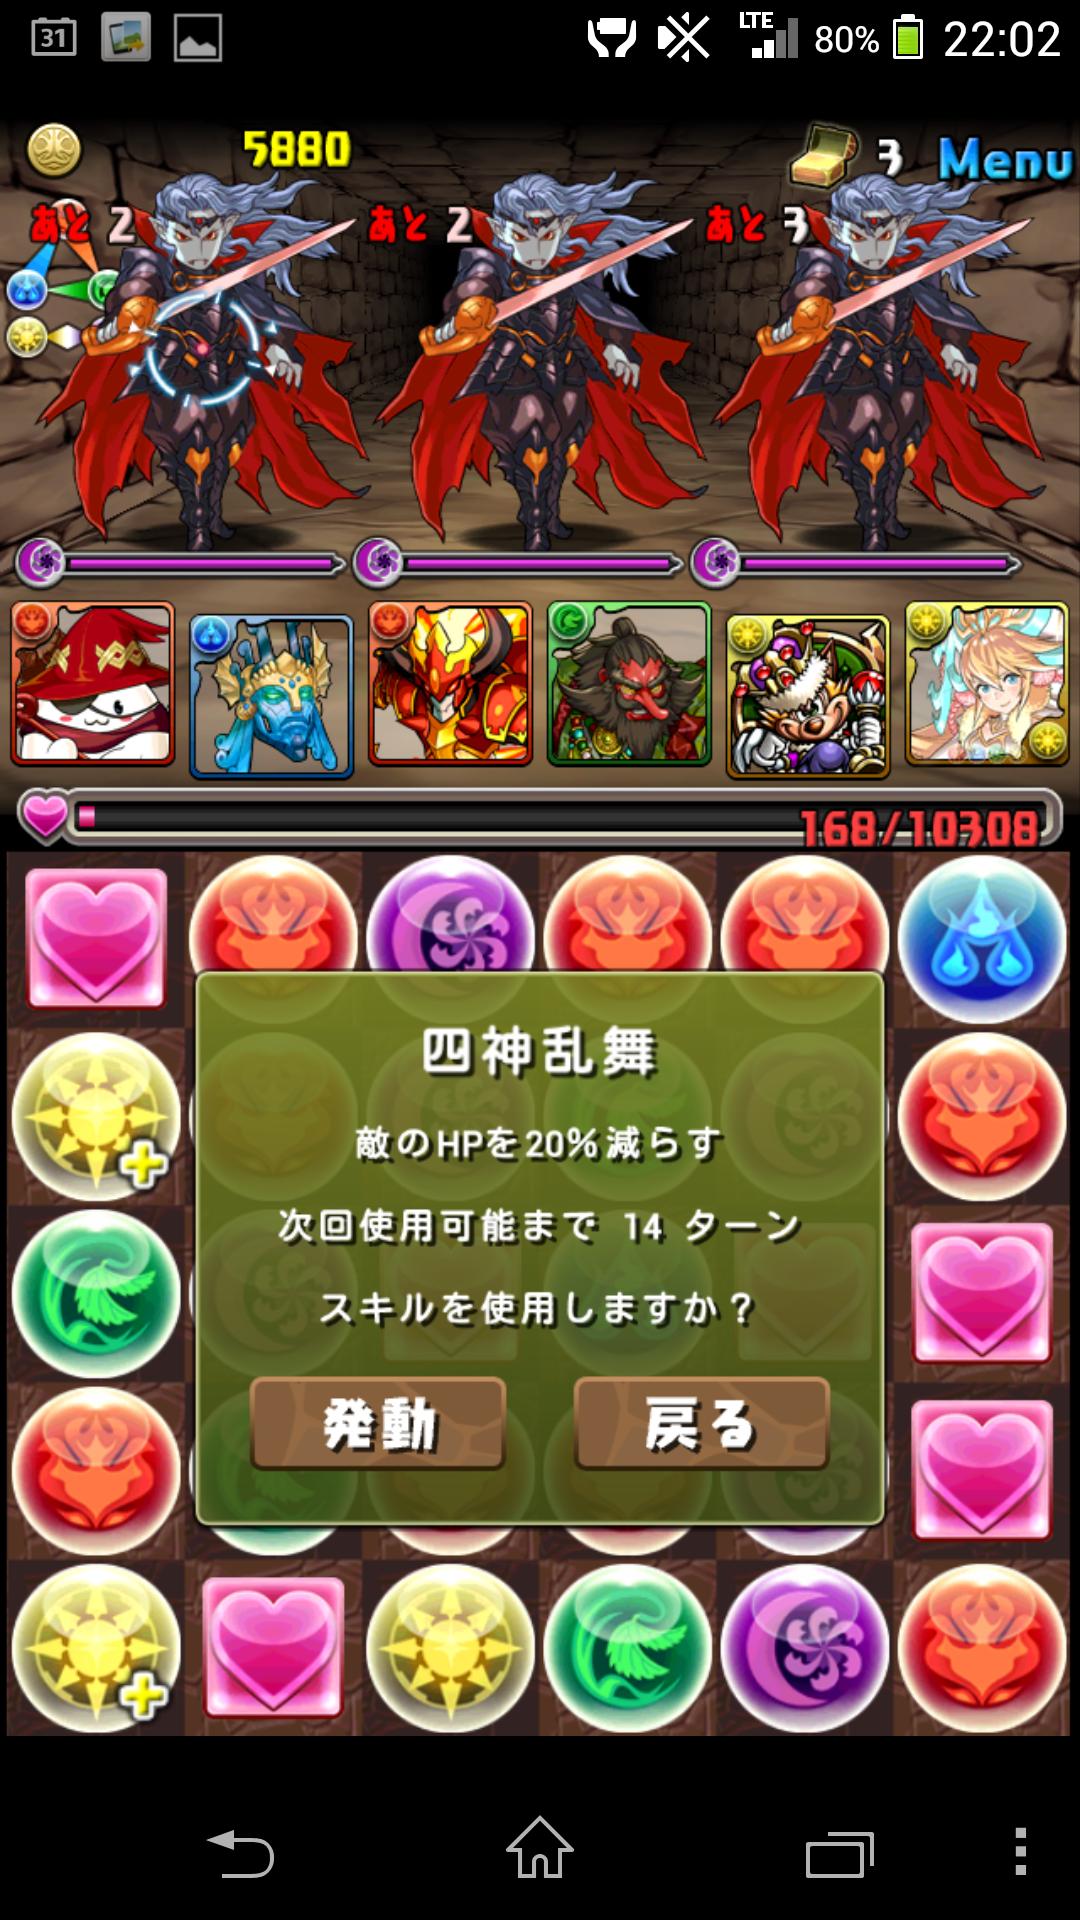 Screenshot_2014-05-12-22-02-30.png